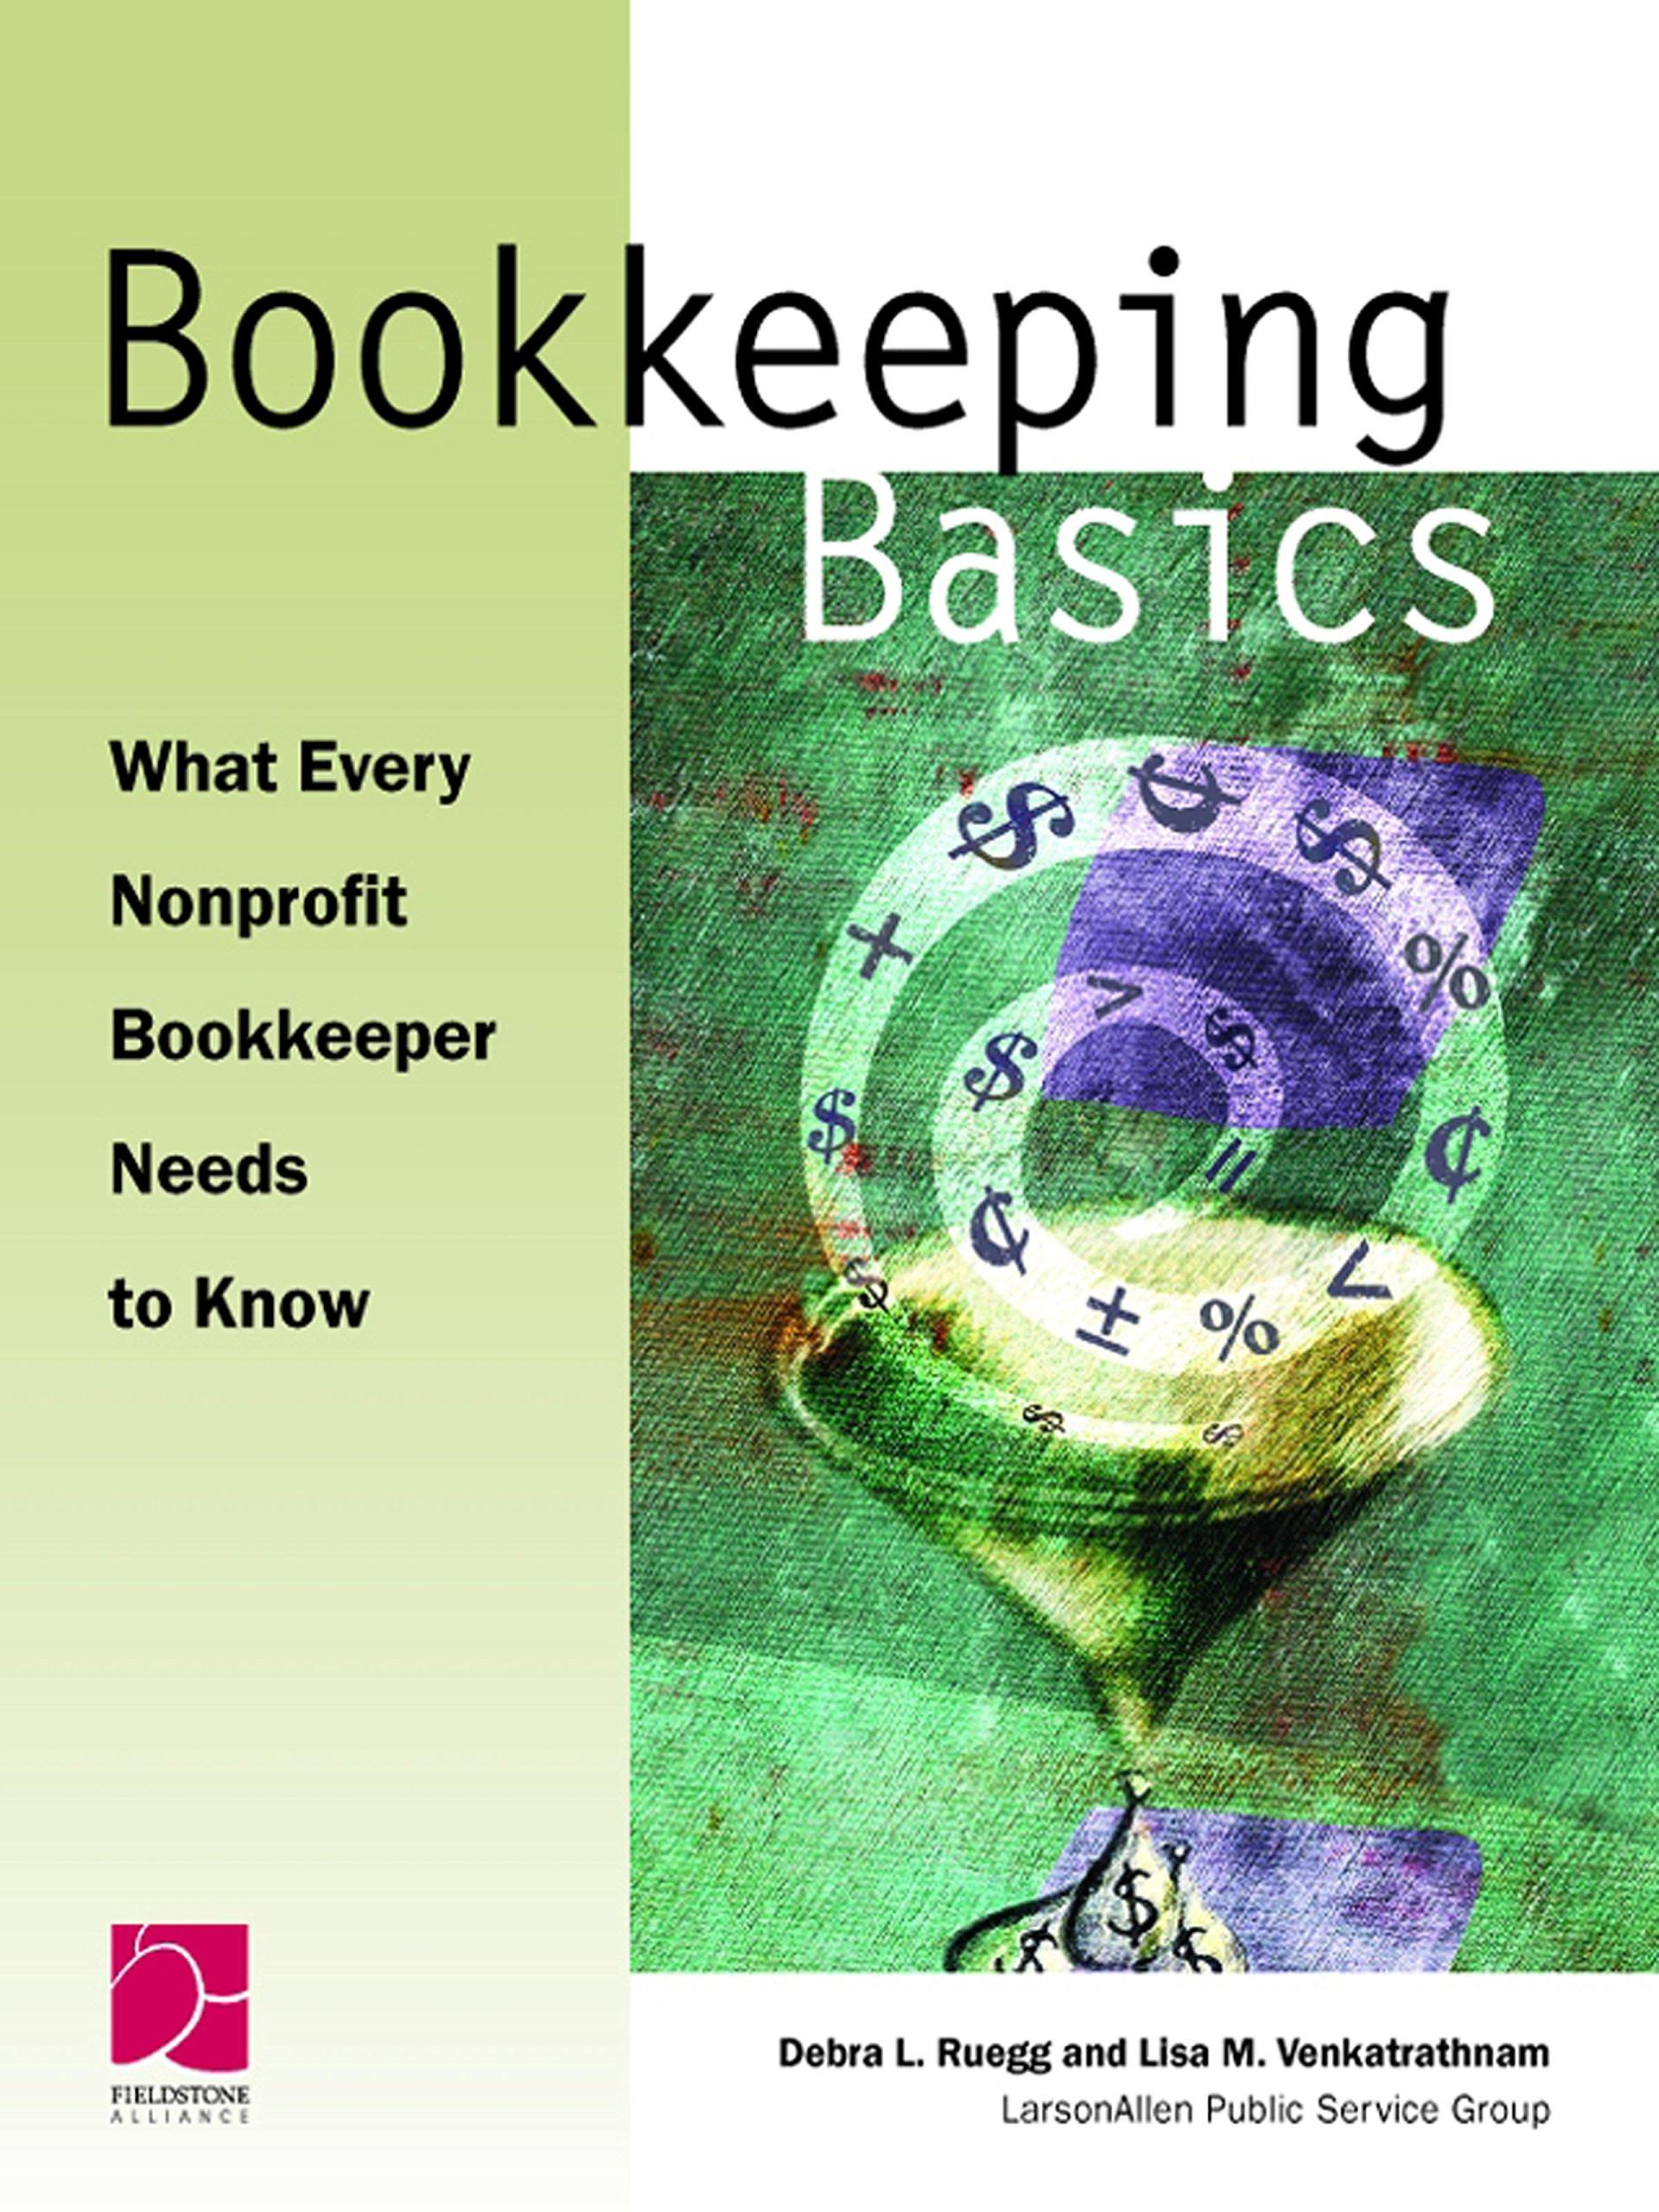 amazoncom bookkeeping basics what every nonprofit bookkeeper needs to know 9780940069299 debra l ruegg lisa m venkatrathnam books